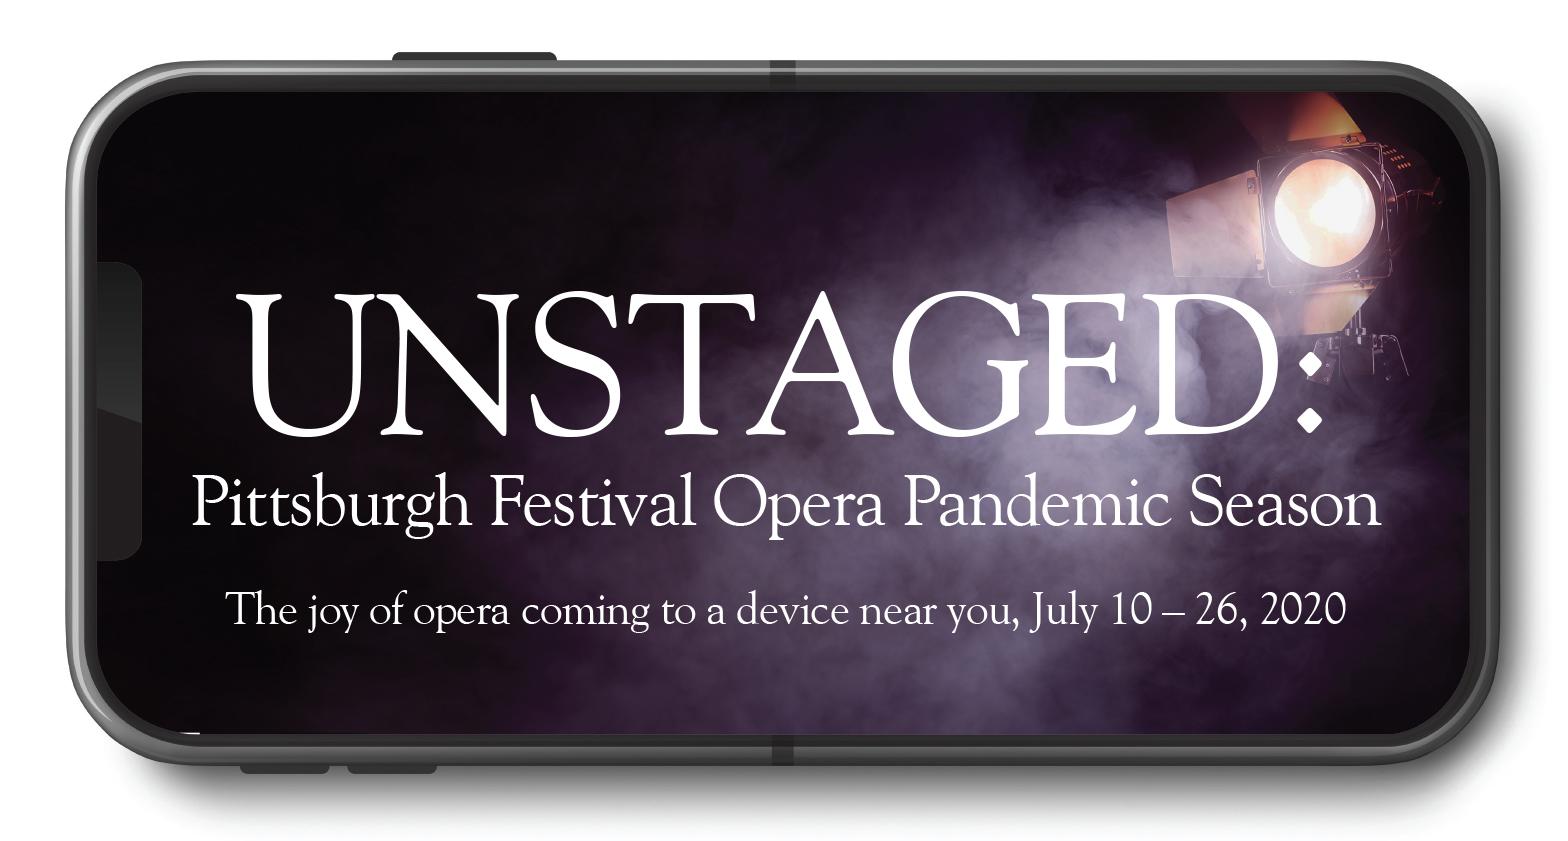 UNSTAGED: Pittsburgh Festival Oper Pandemic Season